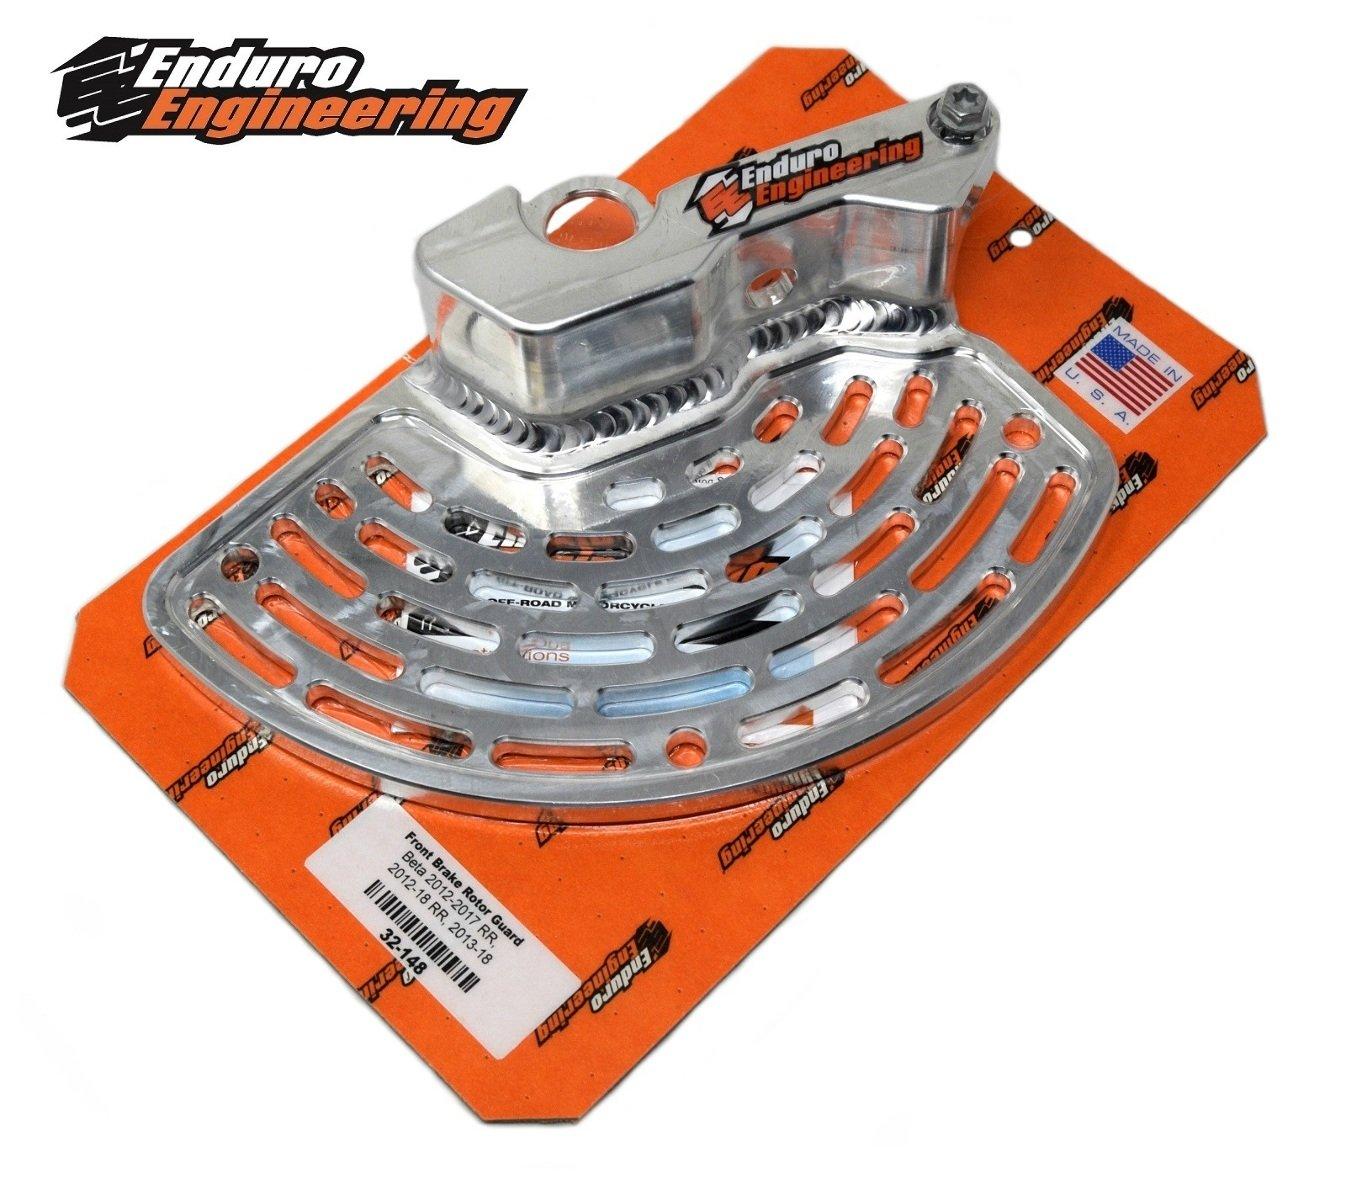 Enduro Engineering 32-148 Front Brake Rotor Disc Guard for Beta 2012-2018 RR